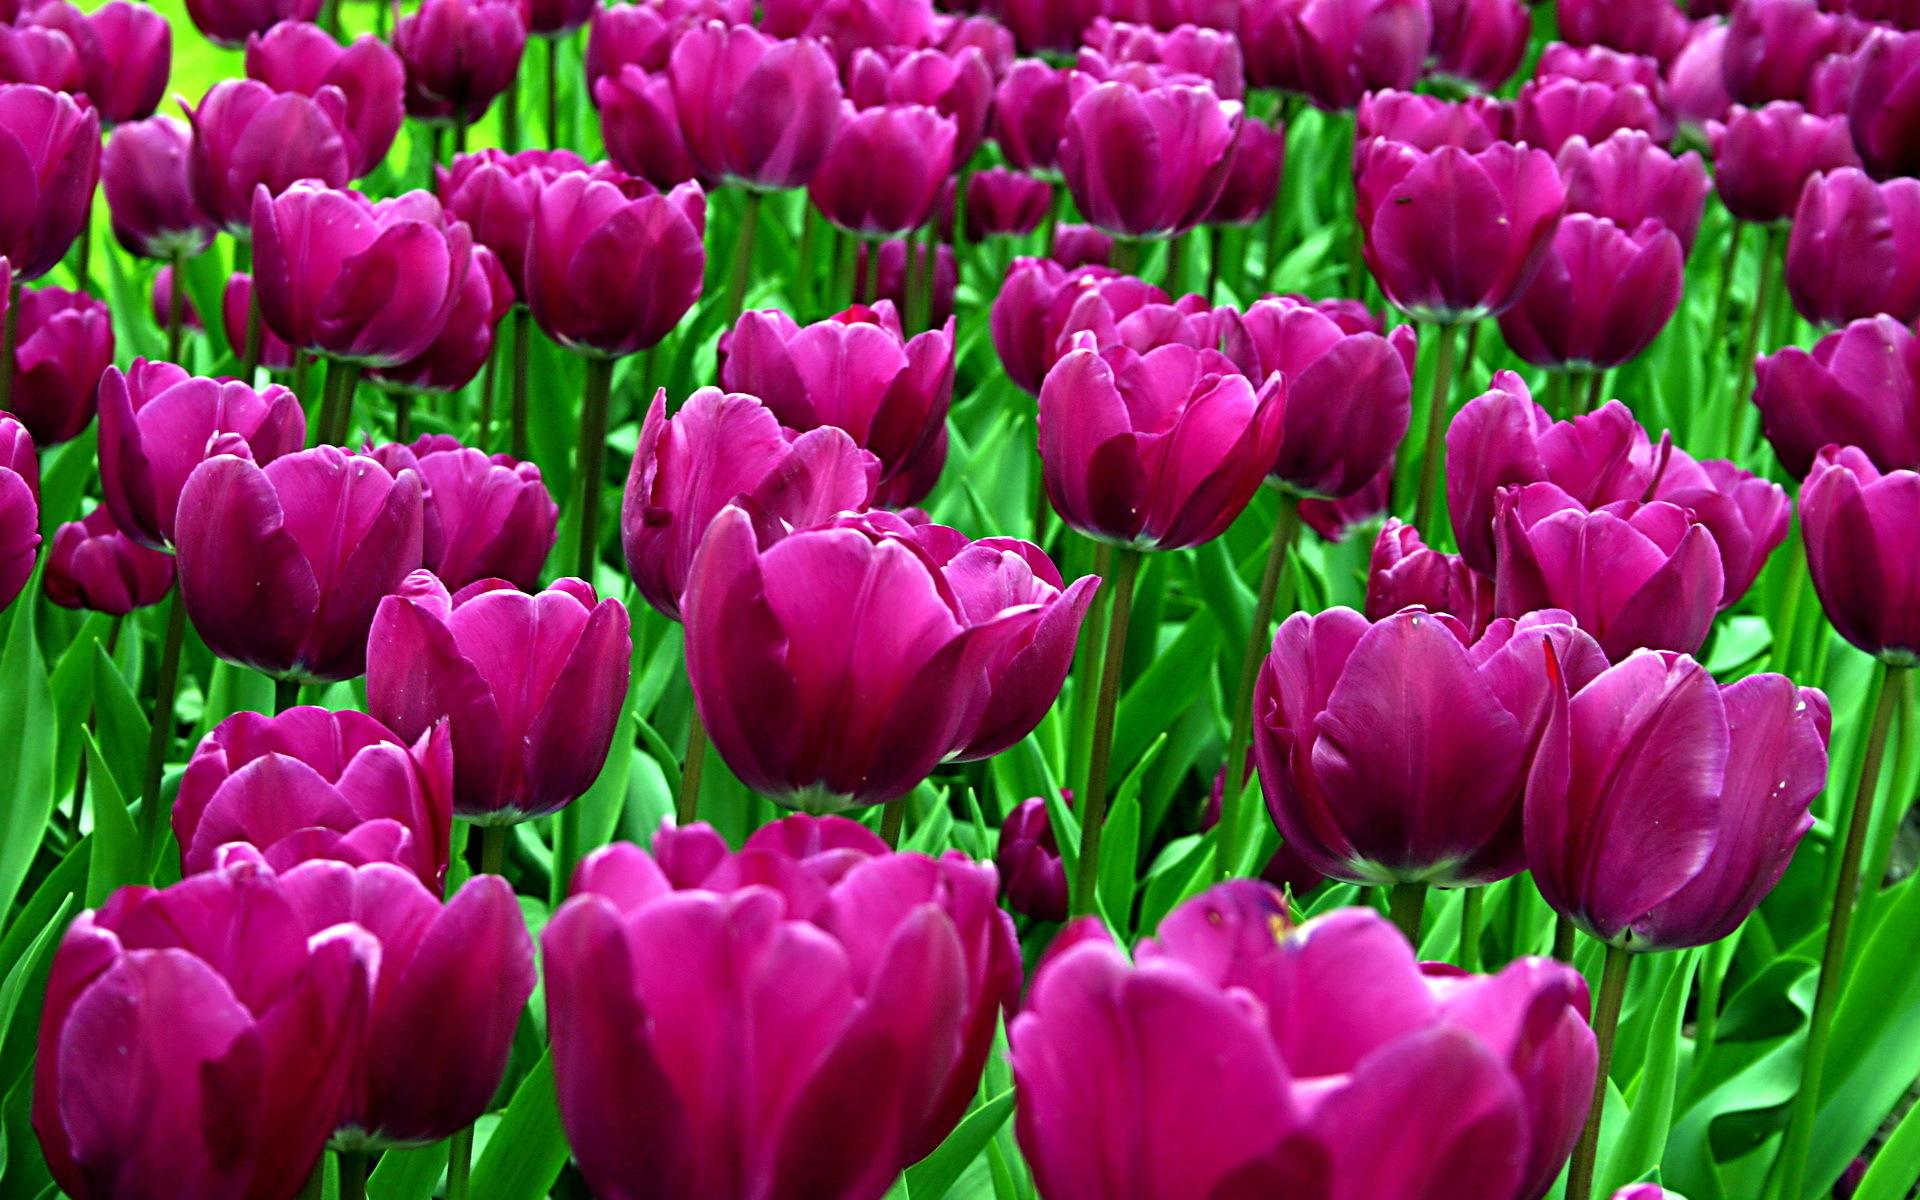 Purple Tulips wallpaper - 870715